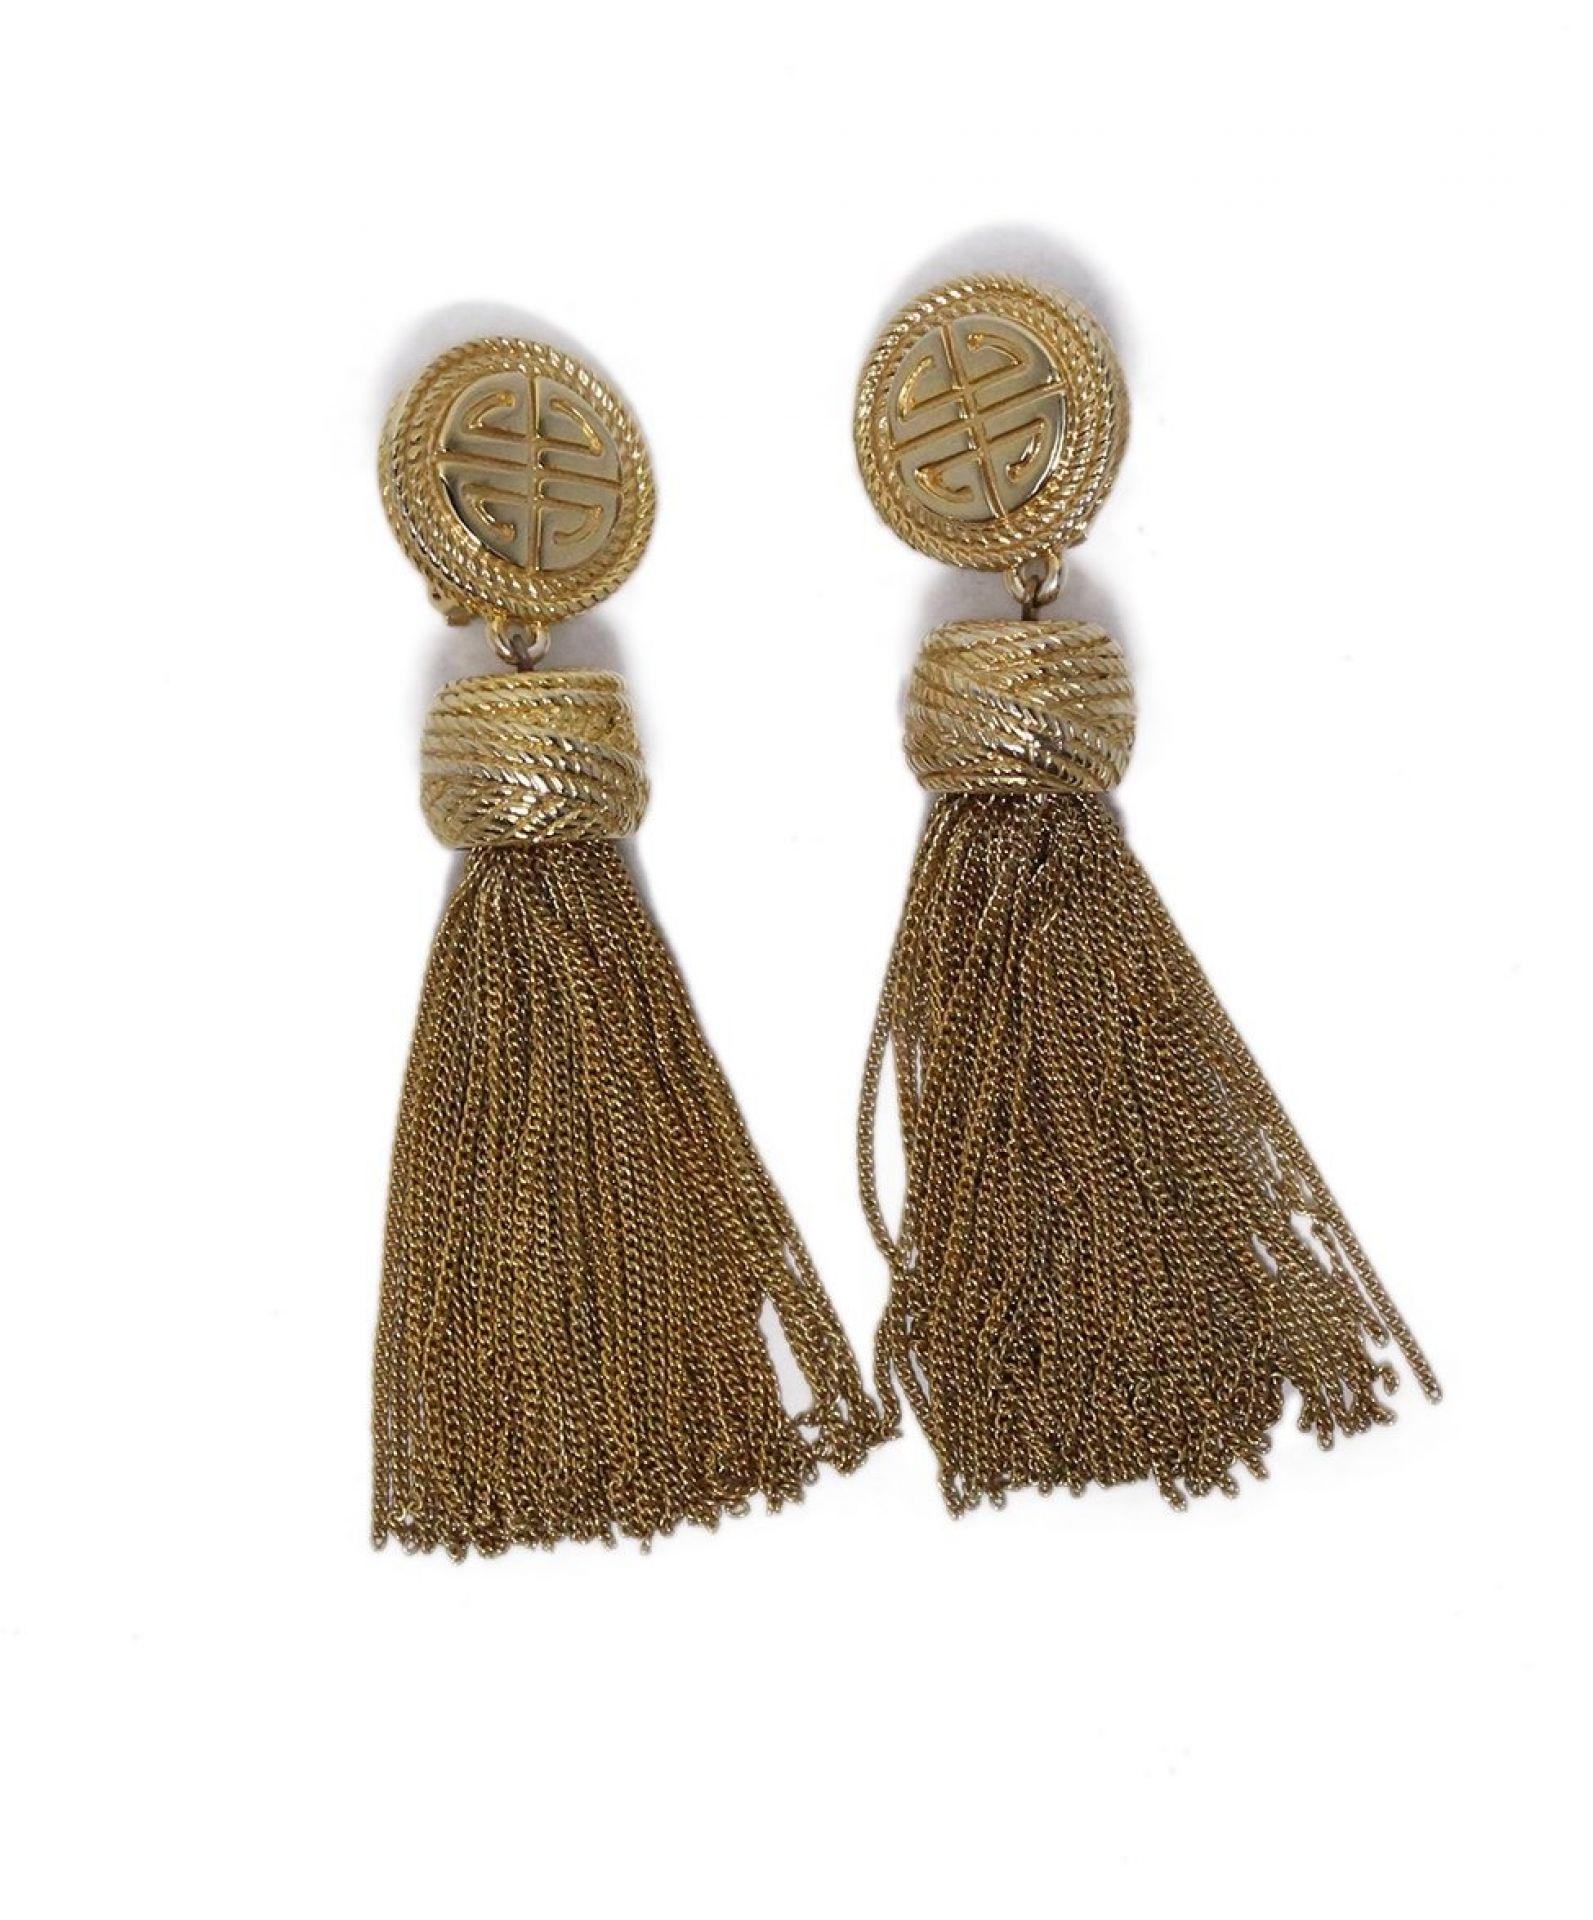 GIVENCHY METALLIC GOLD TASSEL DANGLE CLIP ON EARRINGS